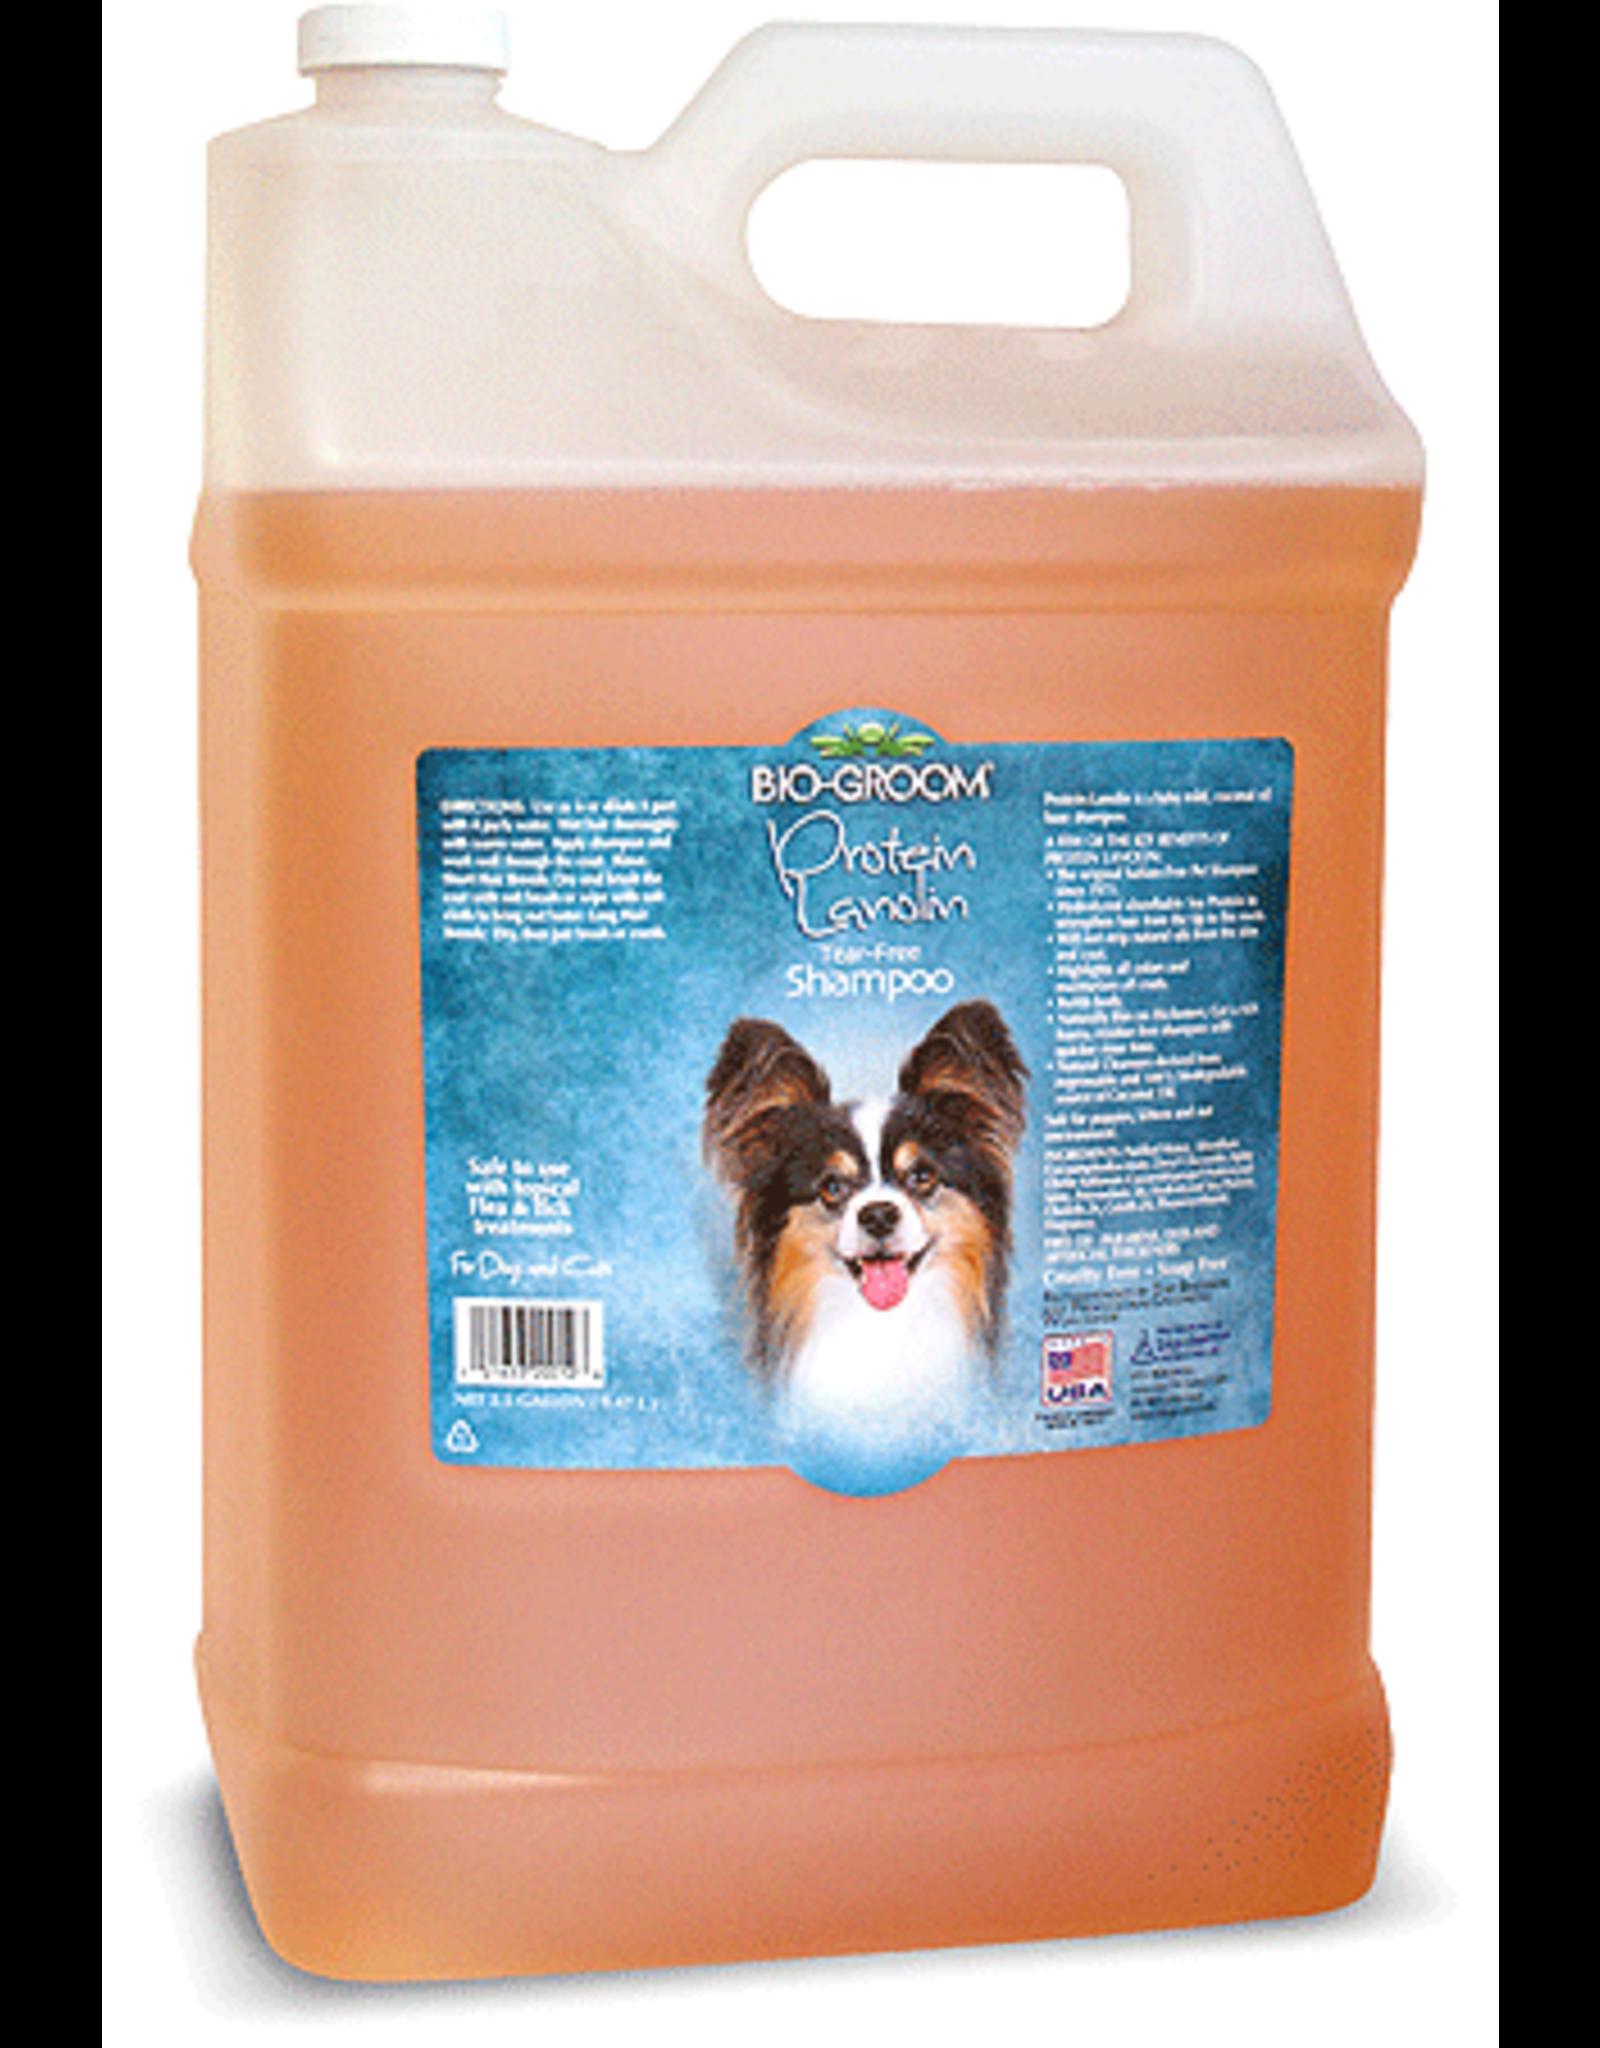 Biogroom BIOGROOM Protein Lanolin 2.5 G